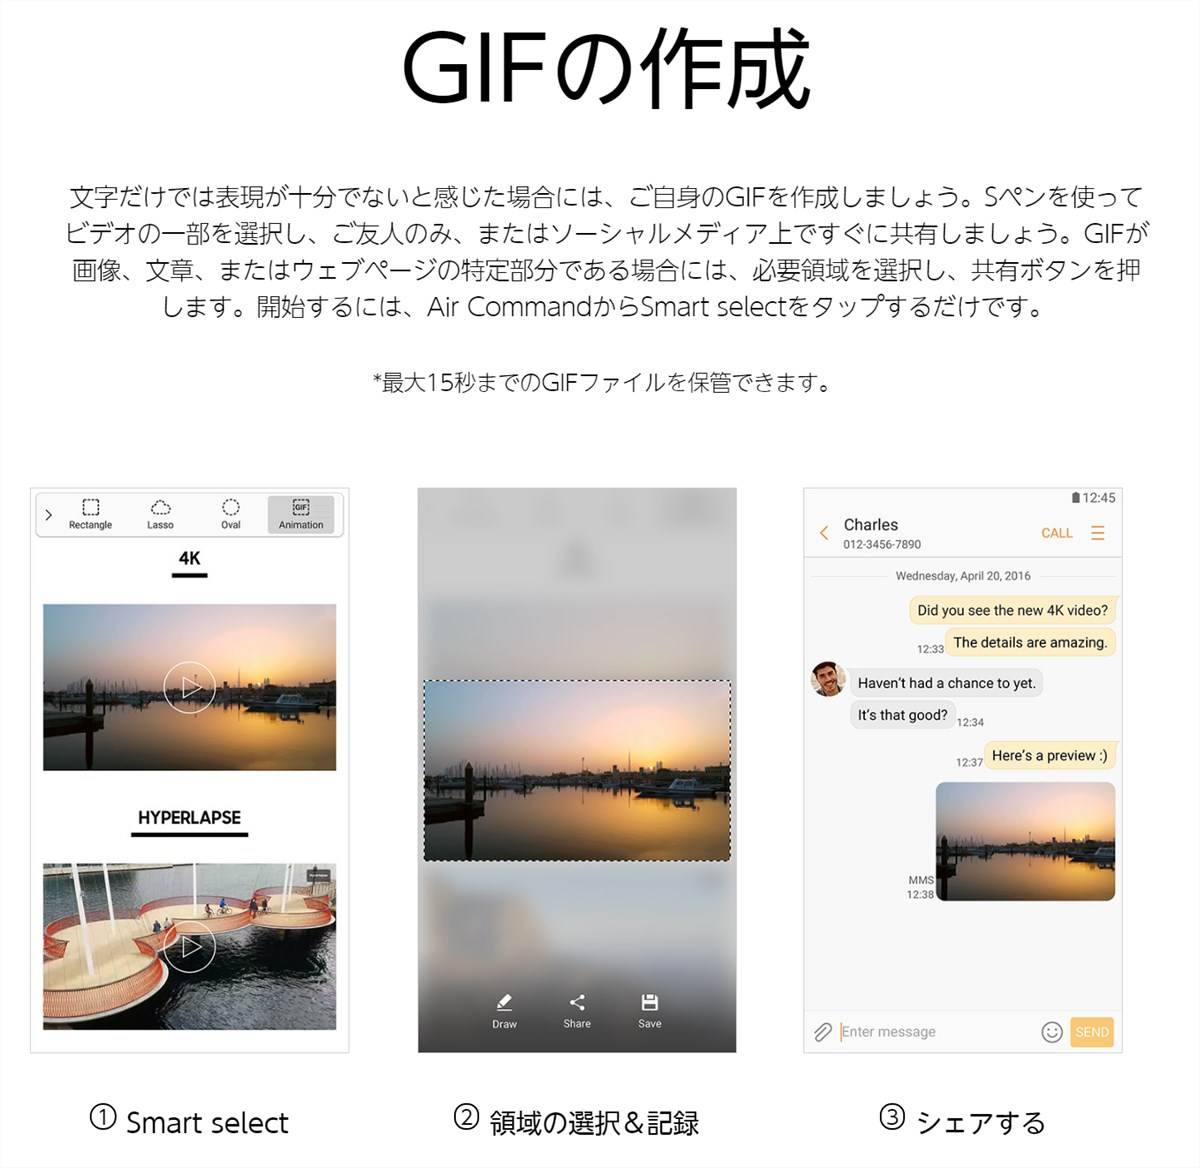 Samsung Galaxy Note 7 - GIF animation